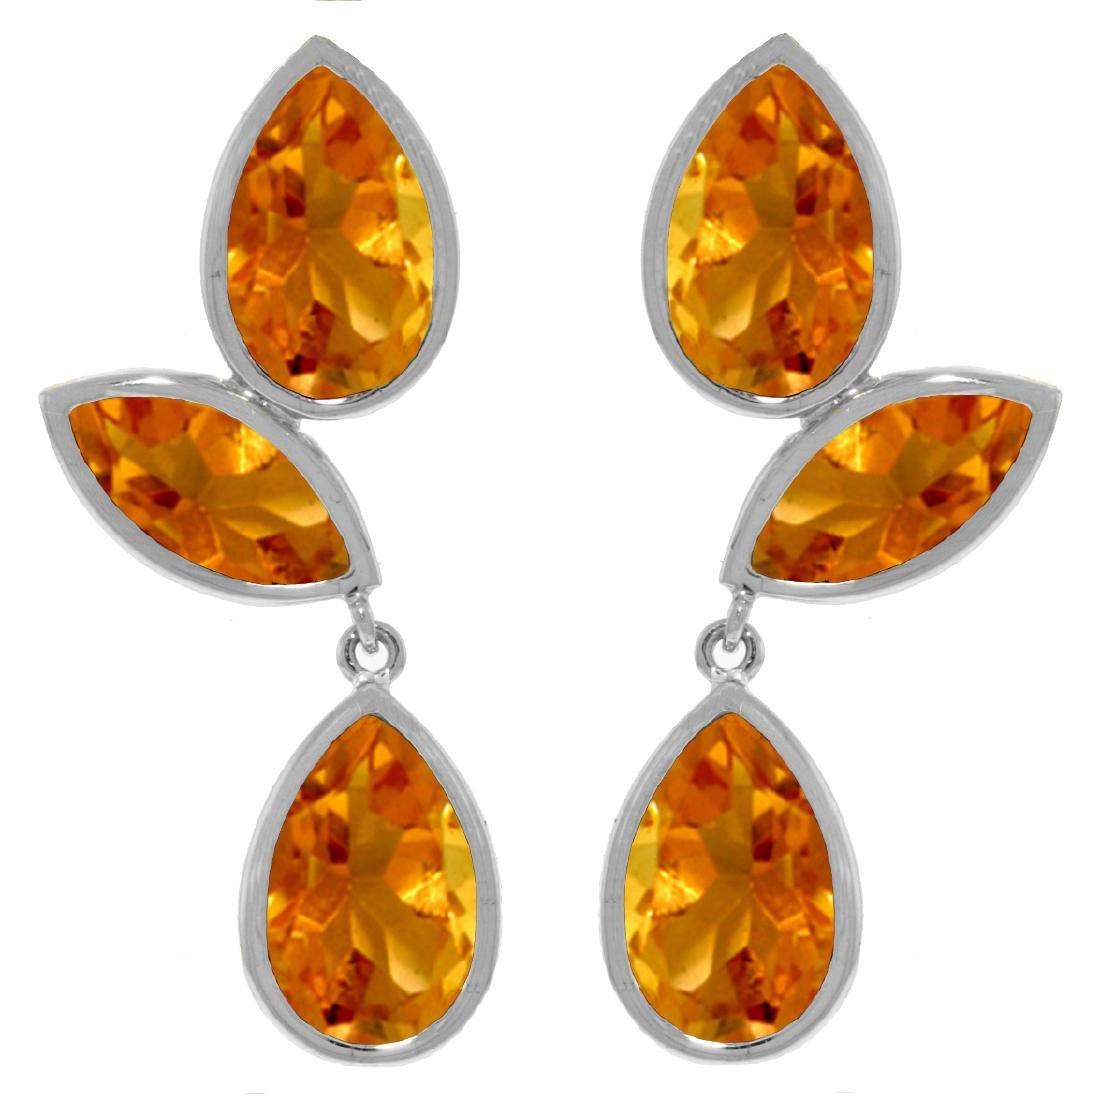 Genuine 13 ctw Citrine Earrings Jewelry 14KT White Gold